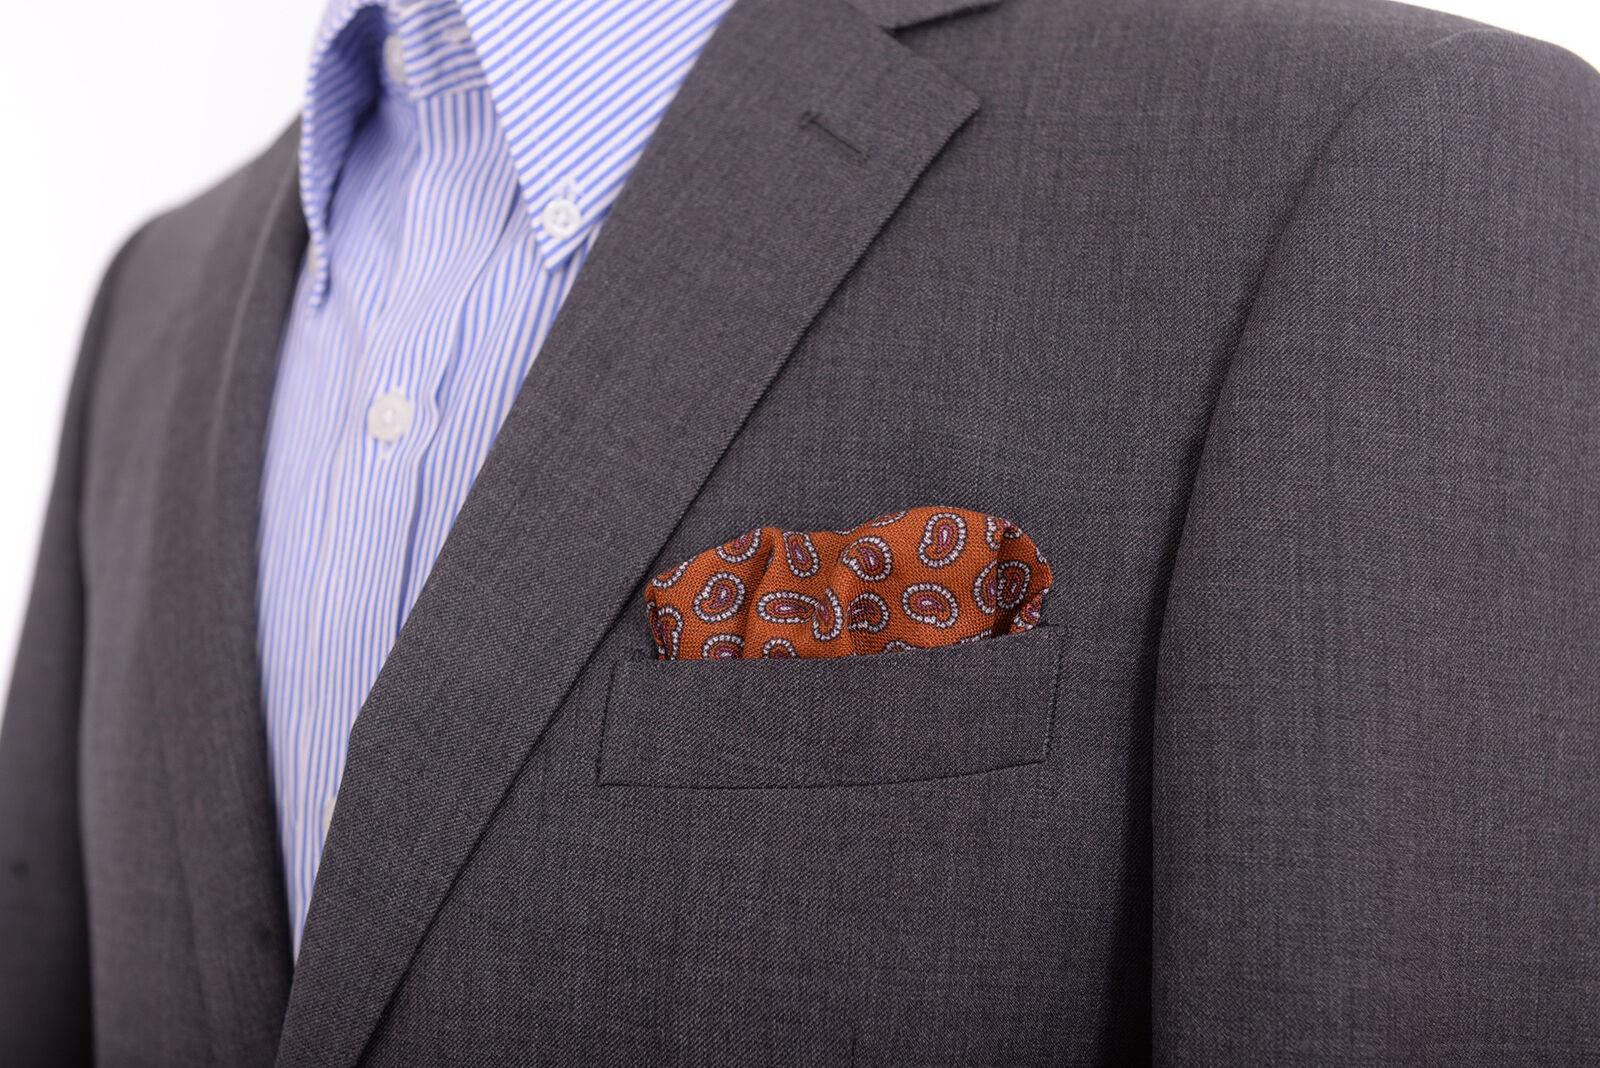 Cesare Attolini Navy Blue Paisley 100/% Silk Pocket Square NWT Handmade in Italy